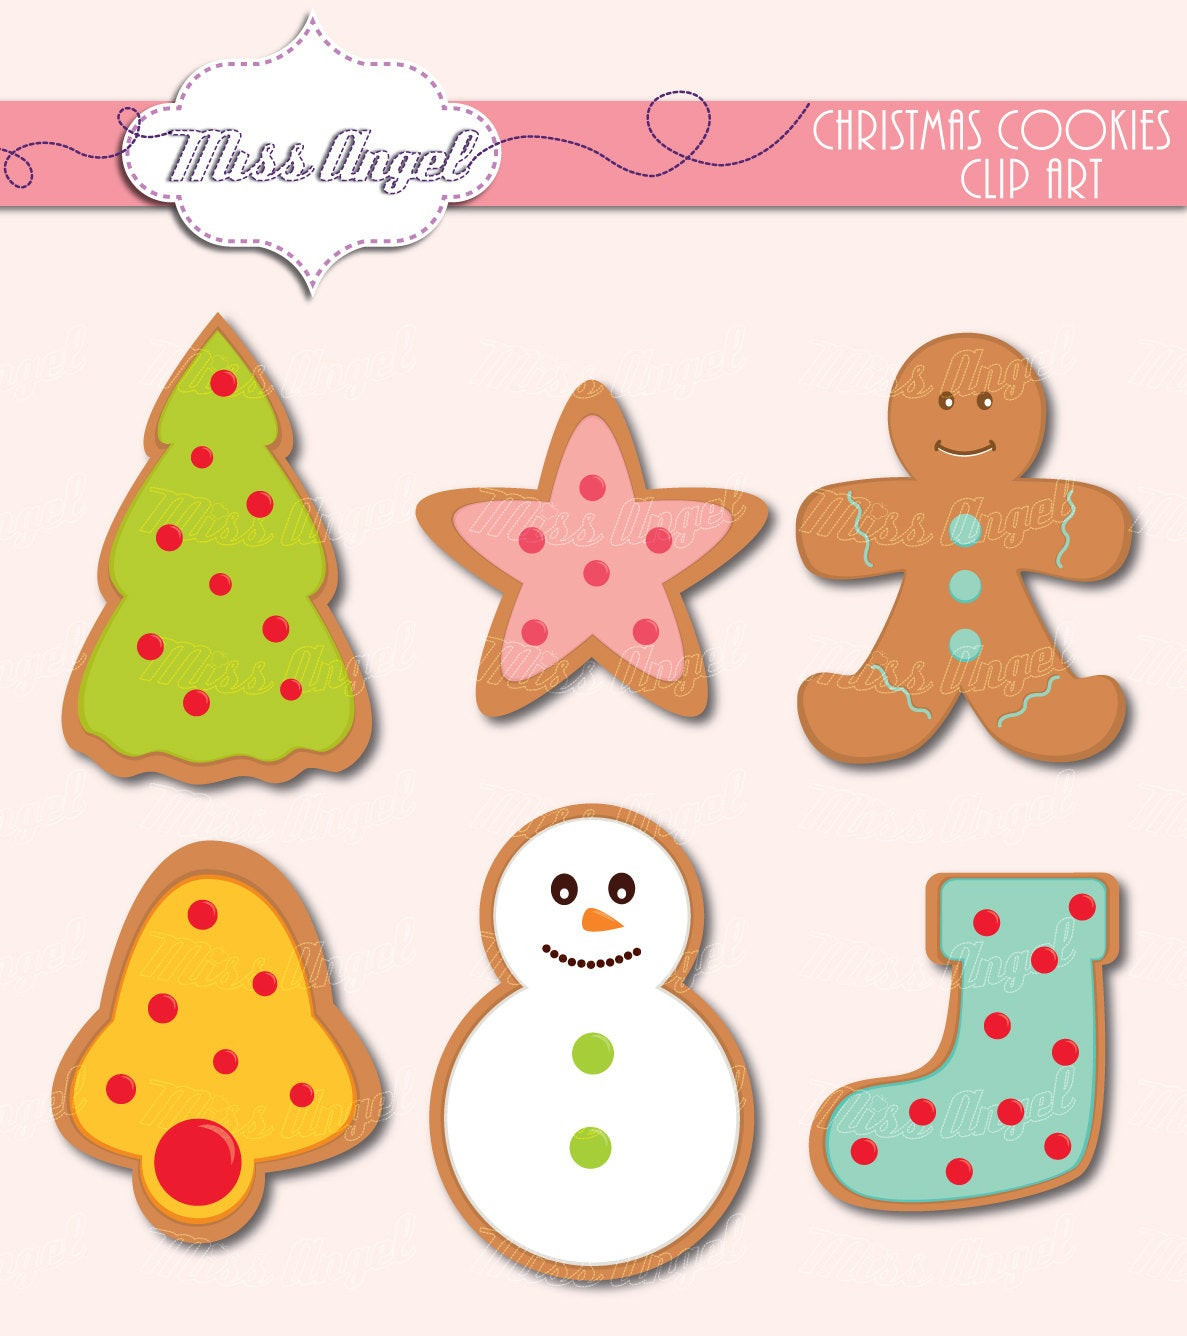 Christmas Cookies Clipart  Christmas Cookies Clip Art 6 Digital Xmas Clipart 6